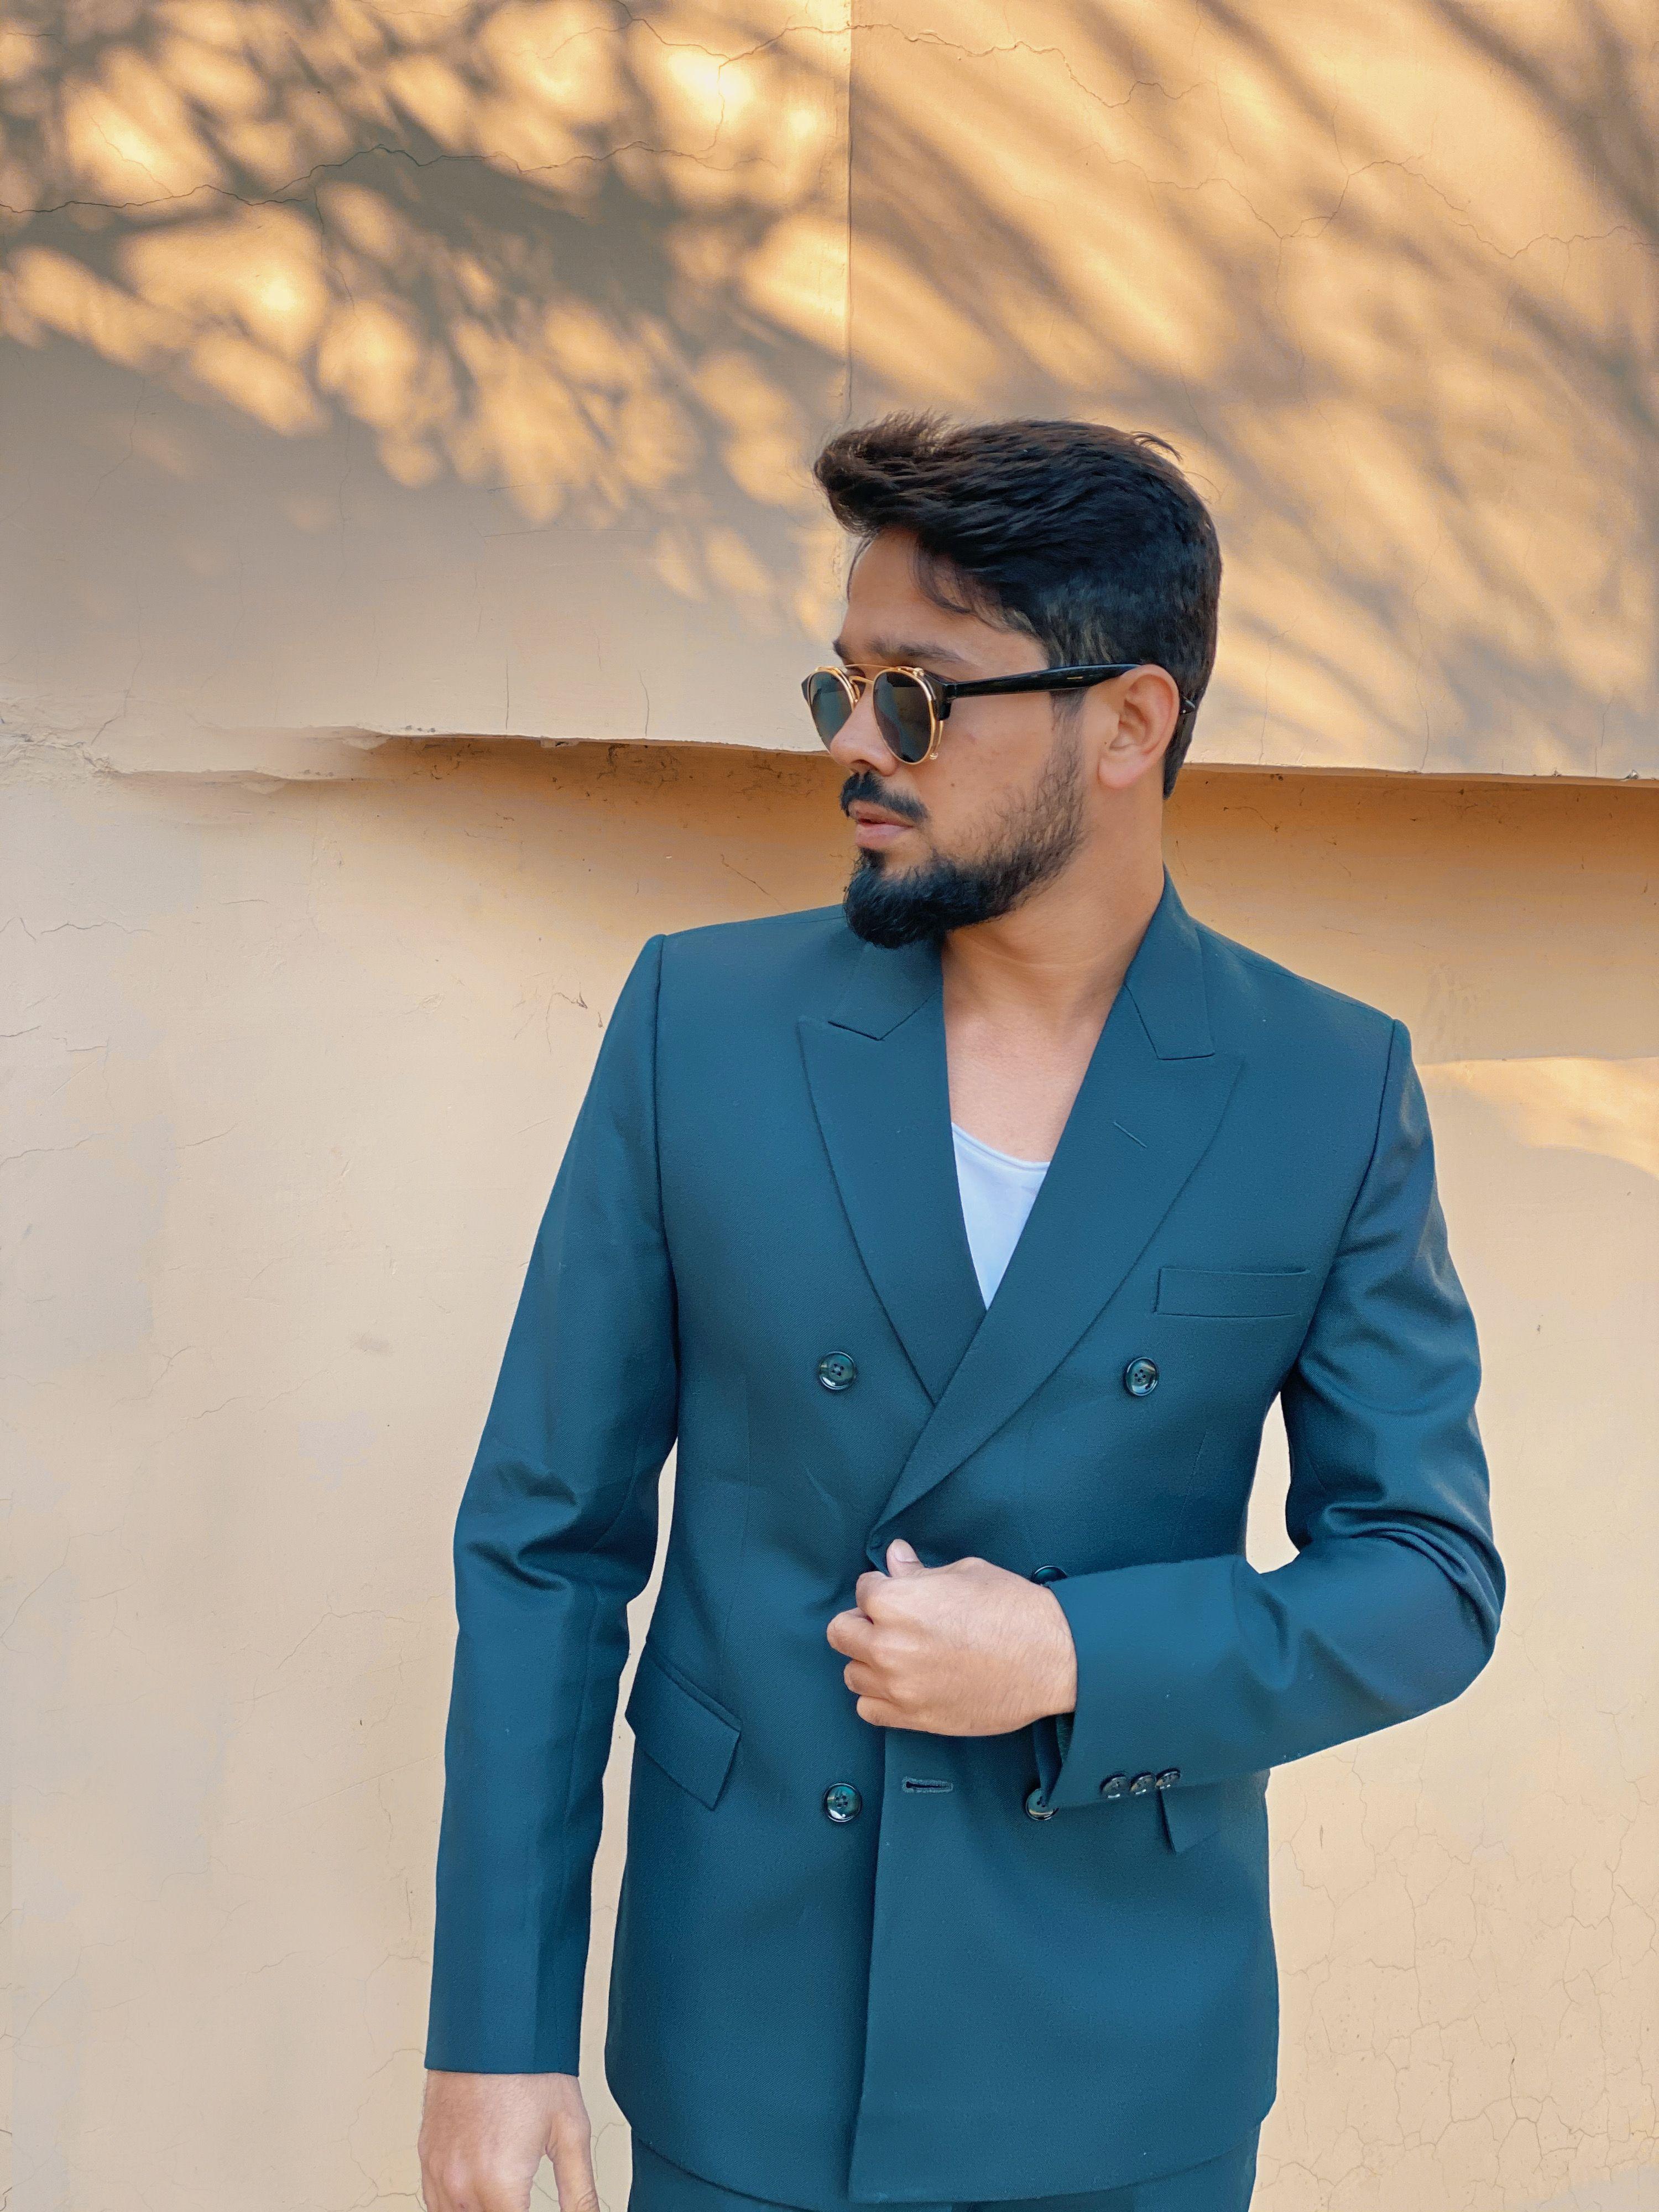 #bloggerstyle #bloggerlife #outfitselfie #styleblogger #fashionblogger #instafashion #styleformen #suitstyle #streetstyle #streetwear #mensfashion #streetfashion #menswear #menstyle #menwithstreetstyle #mwstyles #dapper #mumbaifashionblogger #modamasculina #fashionista #fashion #style #instadaily #instagood #travelphotography #dailyfashion #indianfashionblogger #stayhomechallenge #mumbaifashionblogger #TheEvogue